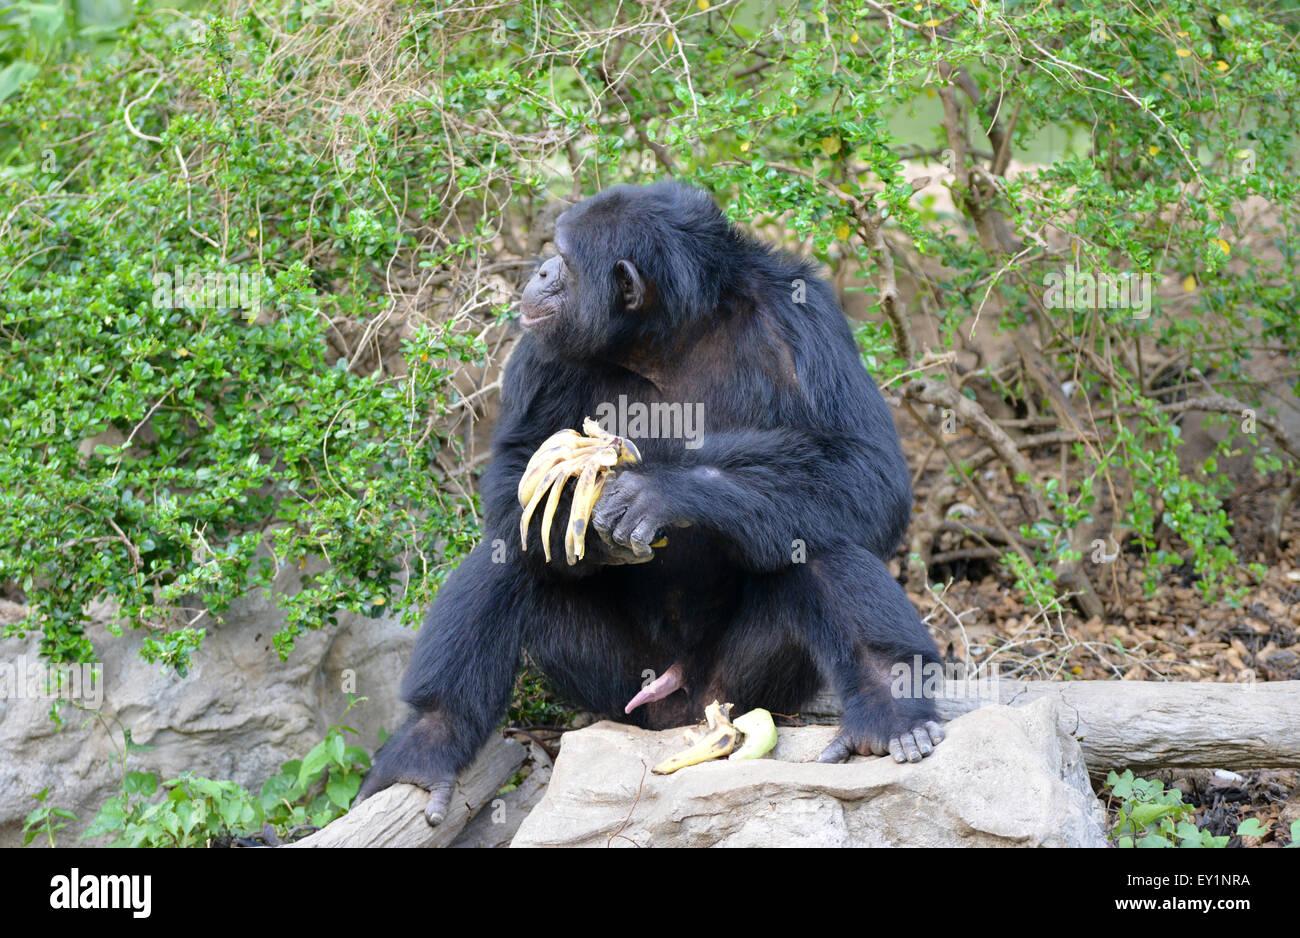 Chimpanzee Eating Banana In Zoo Stock Photo 85476254 Alamy